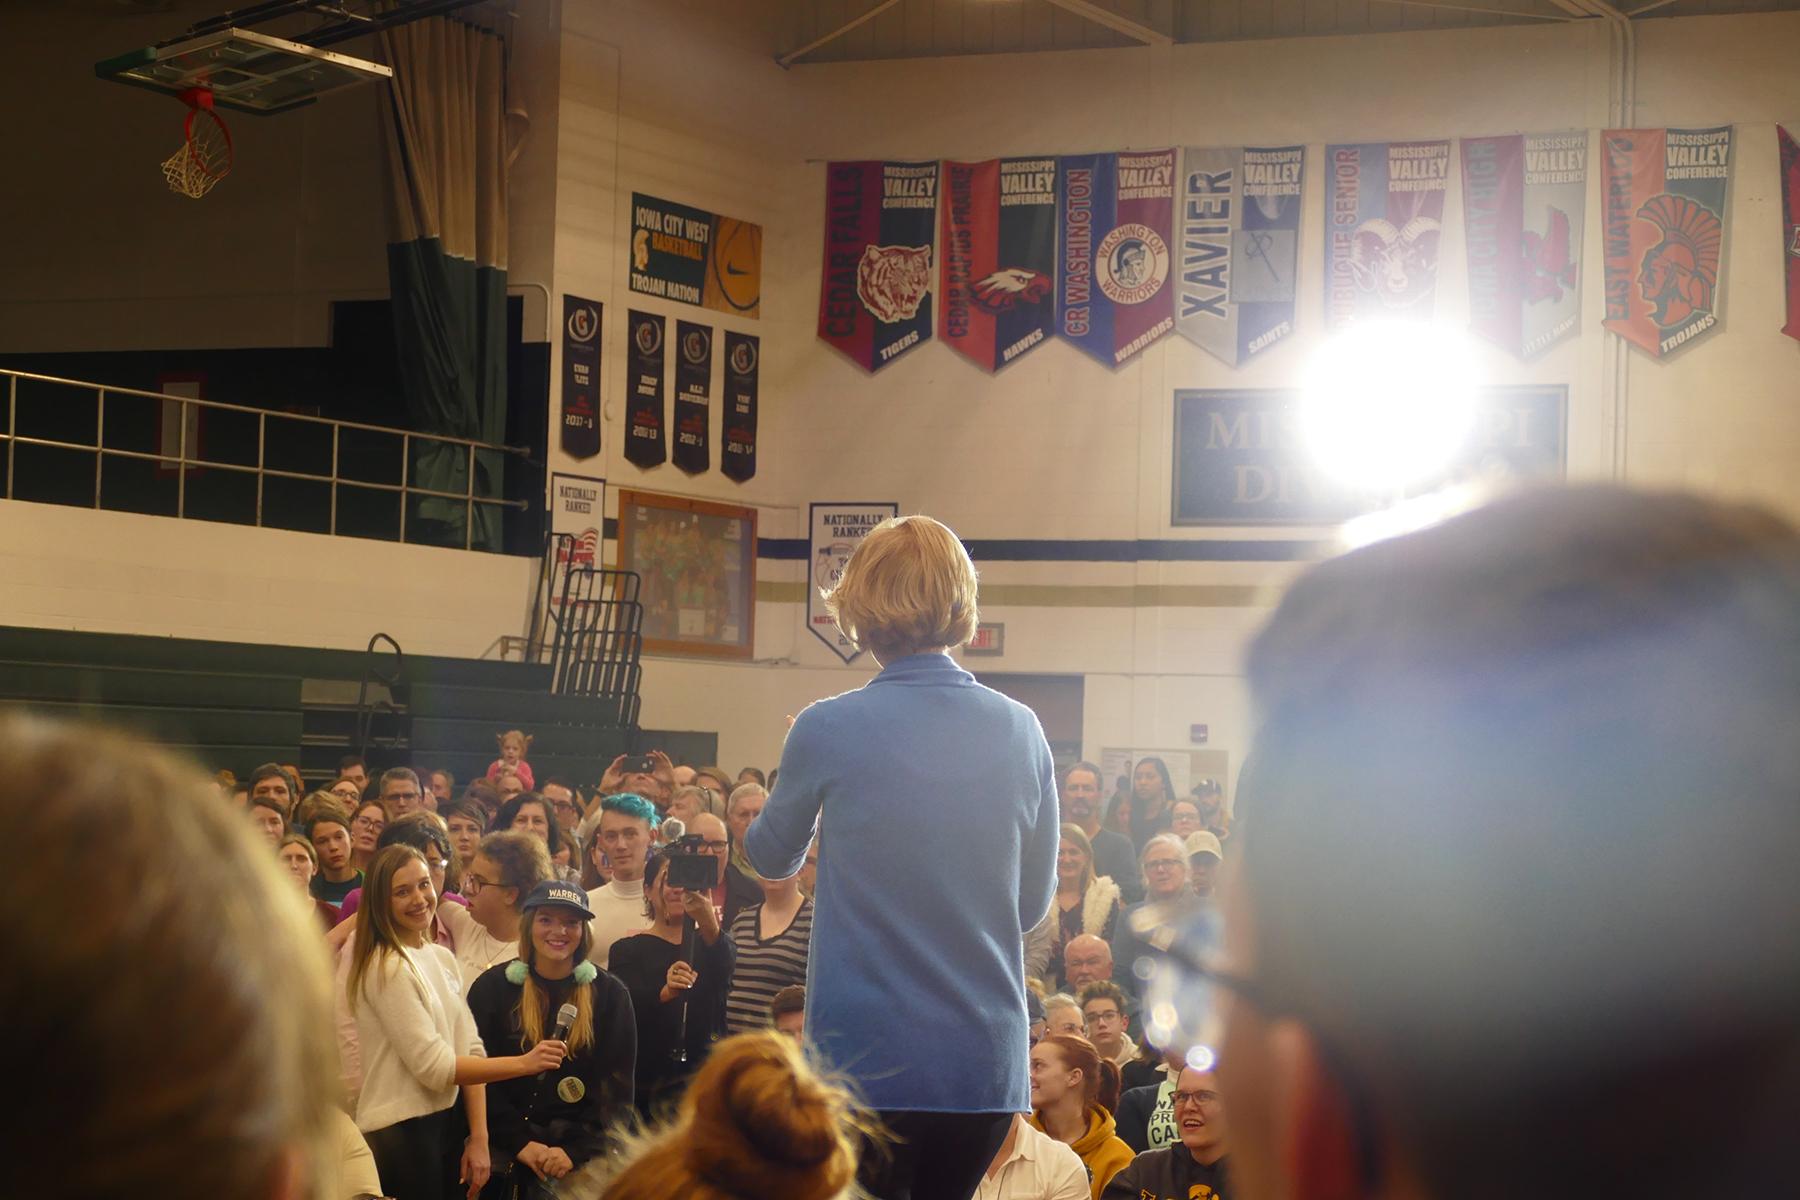 Warren answering voter questions. (Marissa Nelson, 14 East)